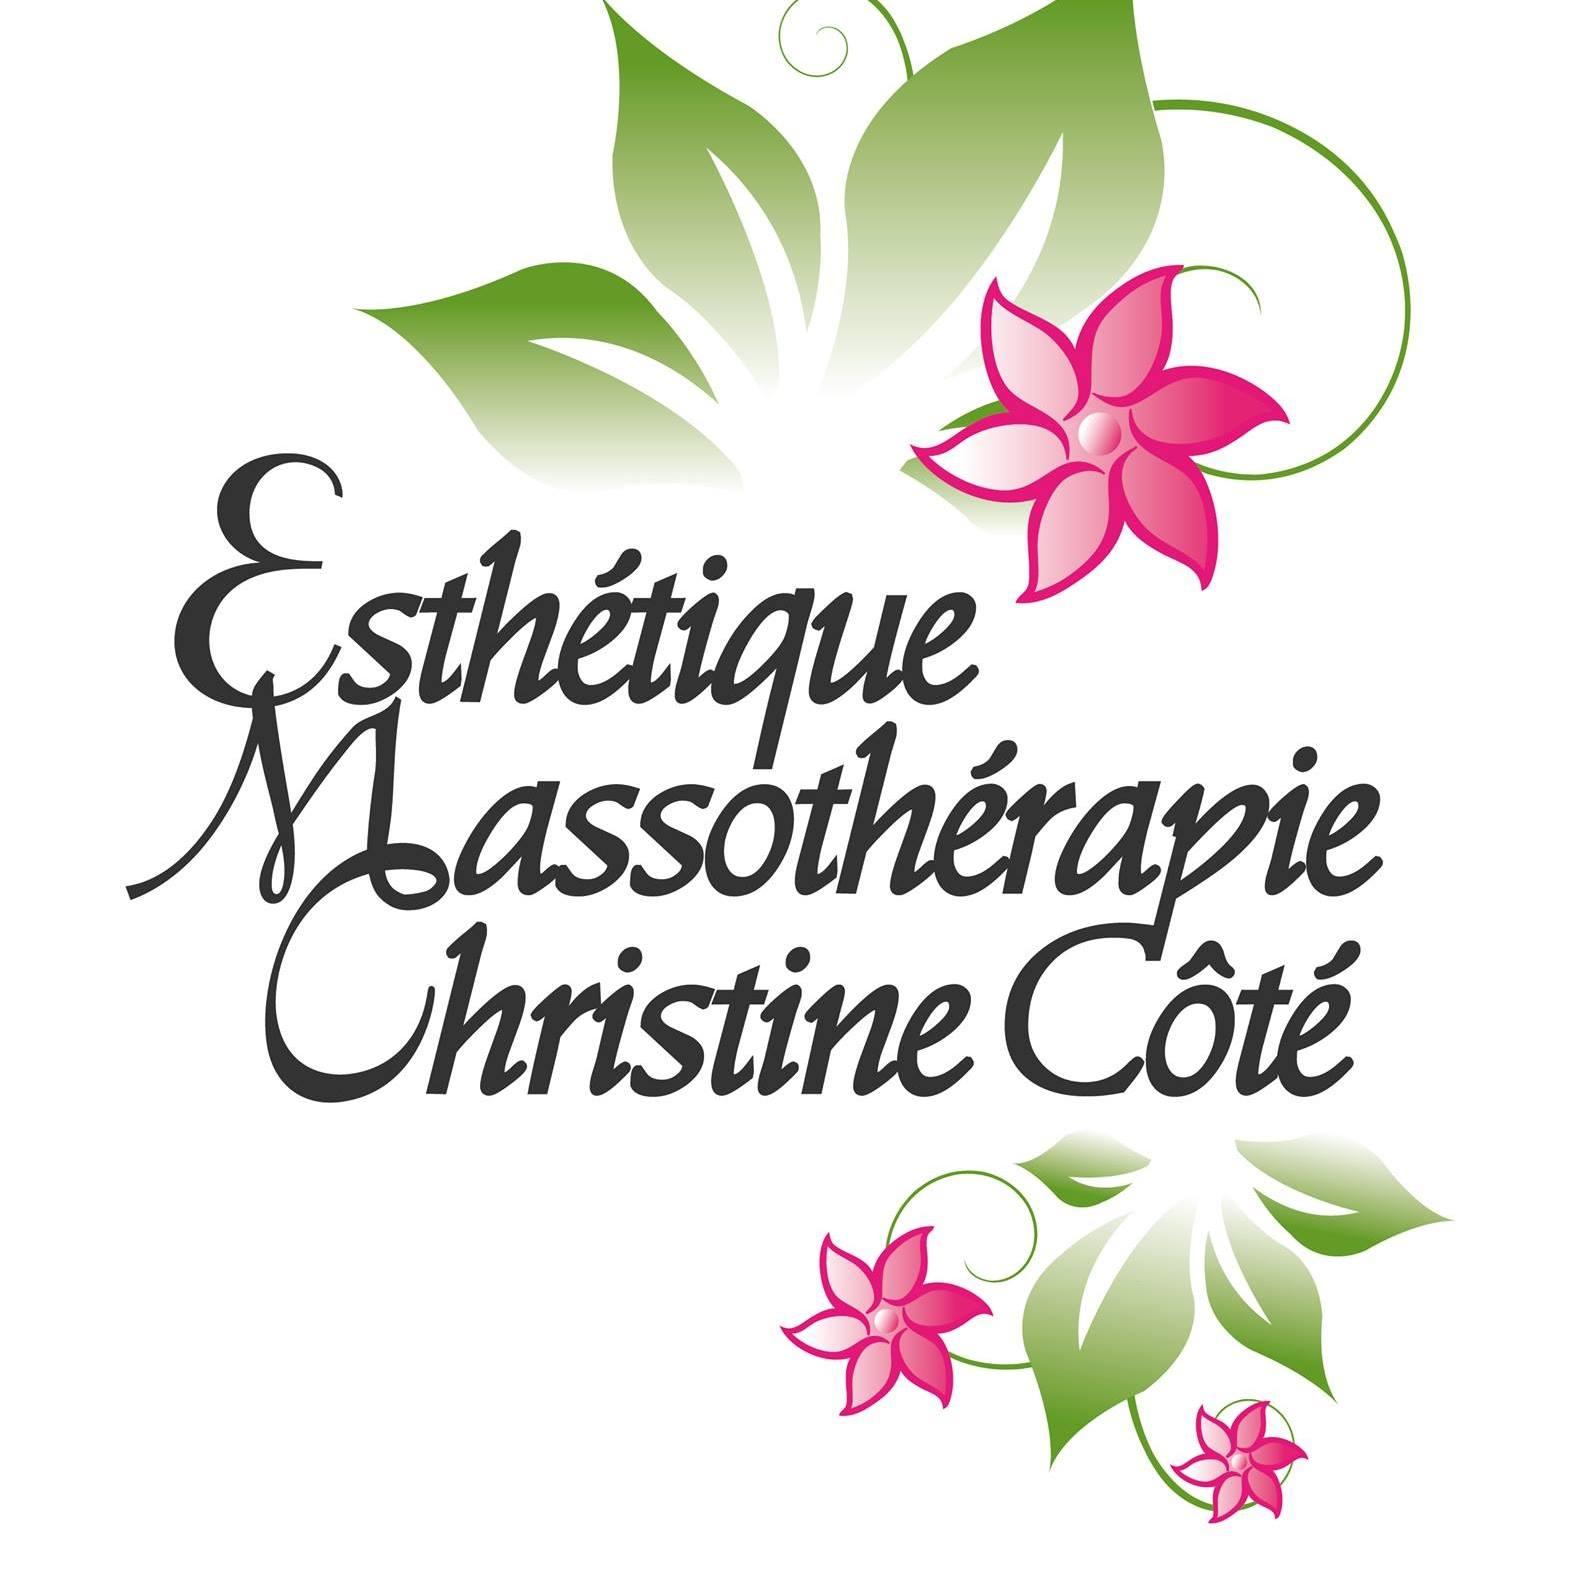 Esthetique Massotherapie Christine Cote